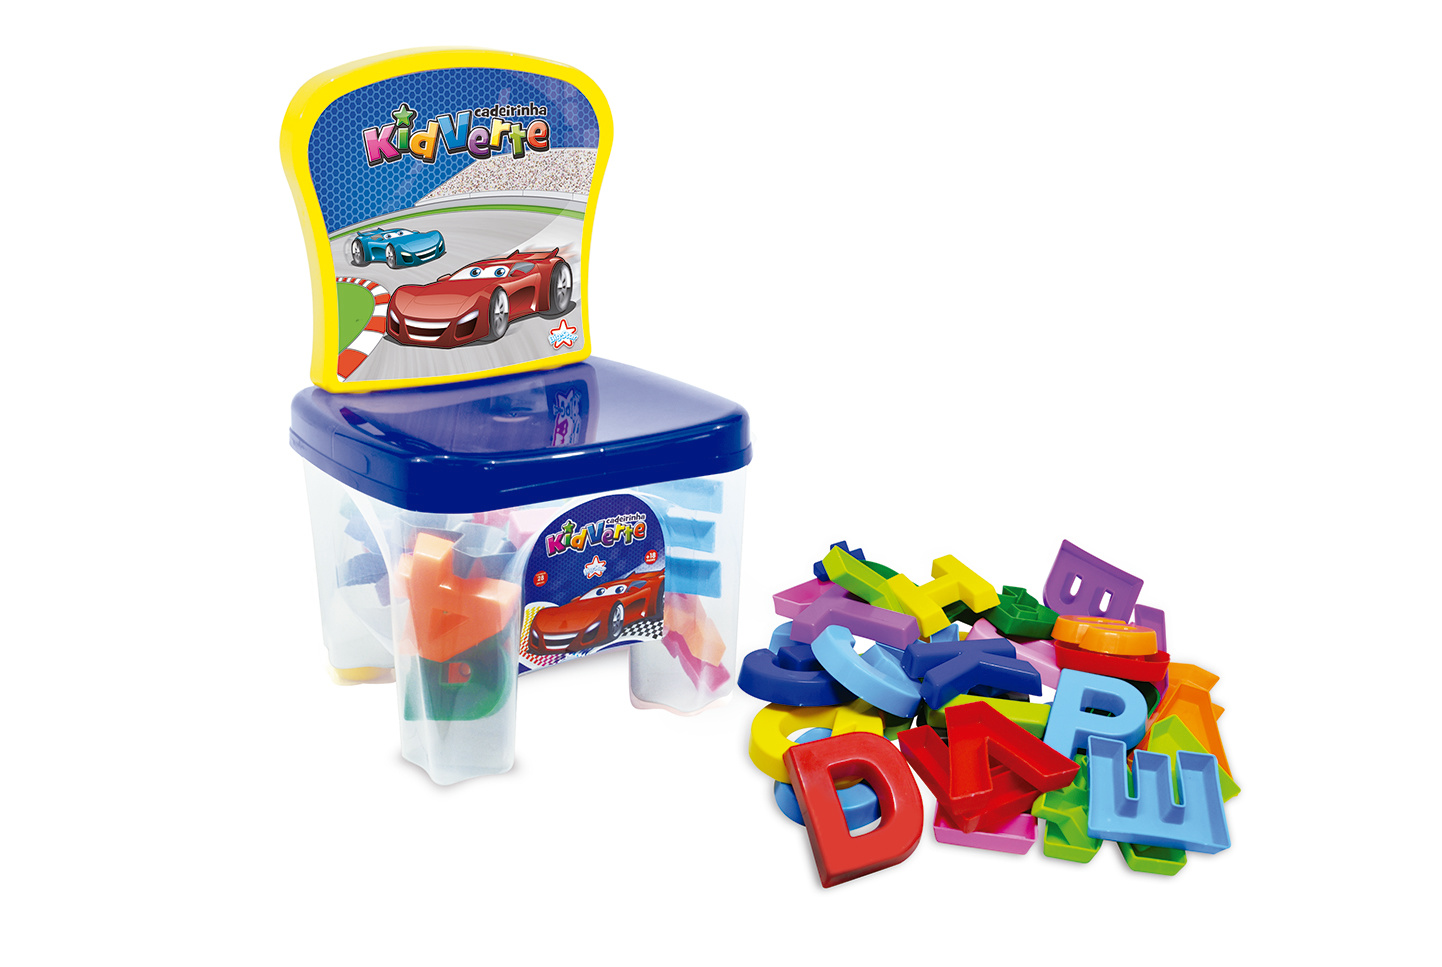 KidVerte Carros Letras e Números